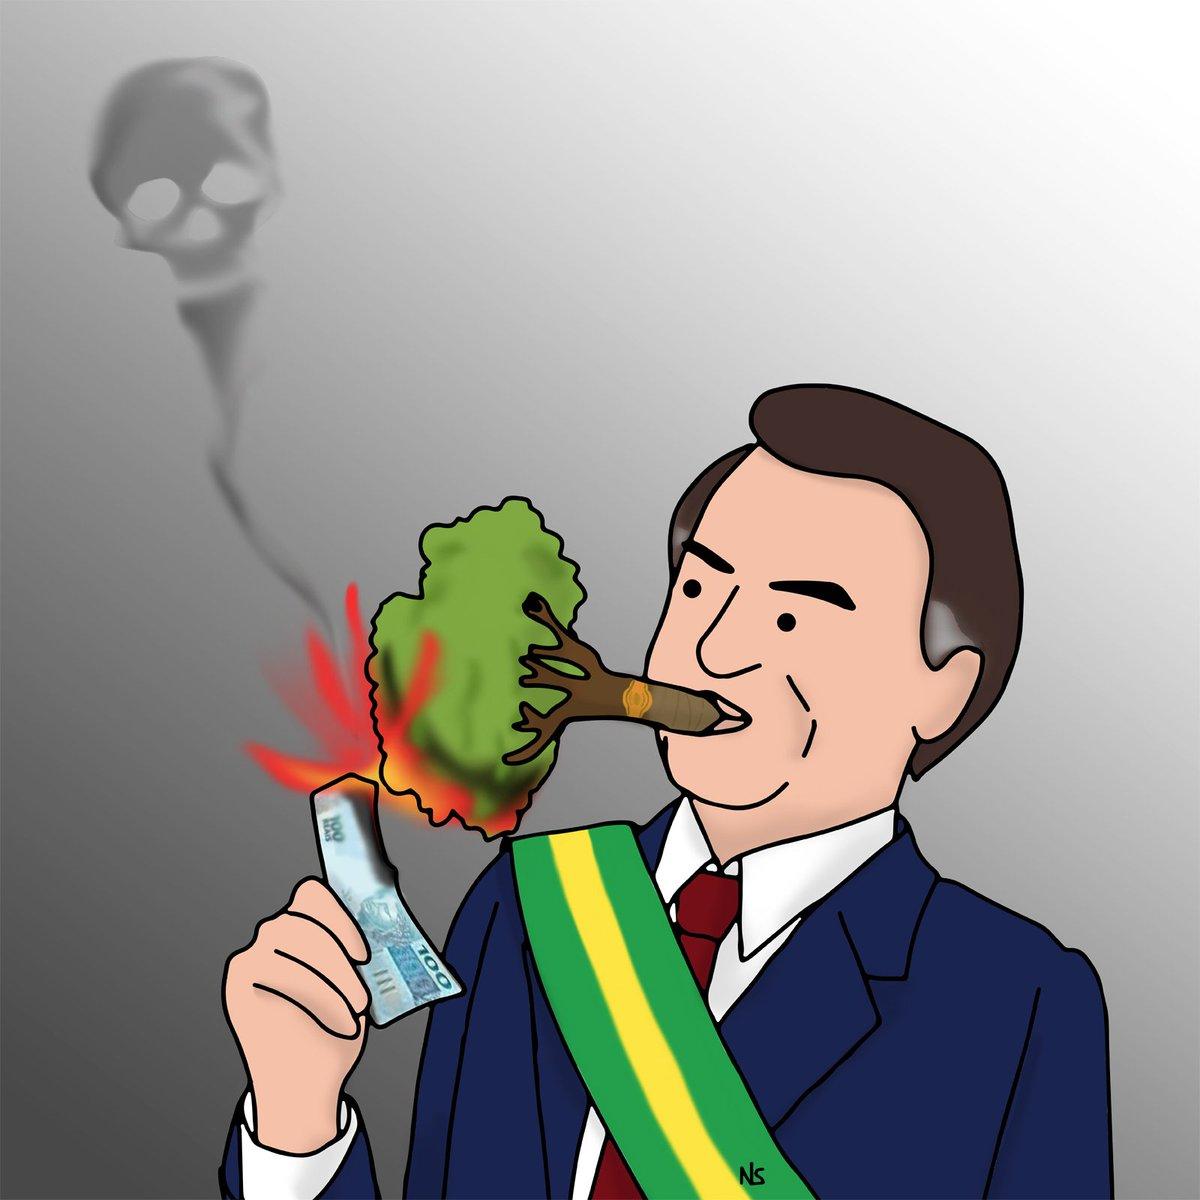 Ordem e progresso#amazzonia #prayforamazonia #forestaamazzonica #brazil #bolsonaro #fire #burningforest #climatechange #rainforest #sosamazonia #enneesse #vignette #satira